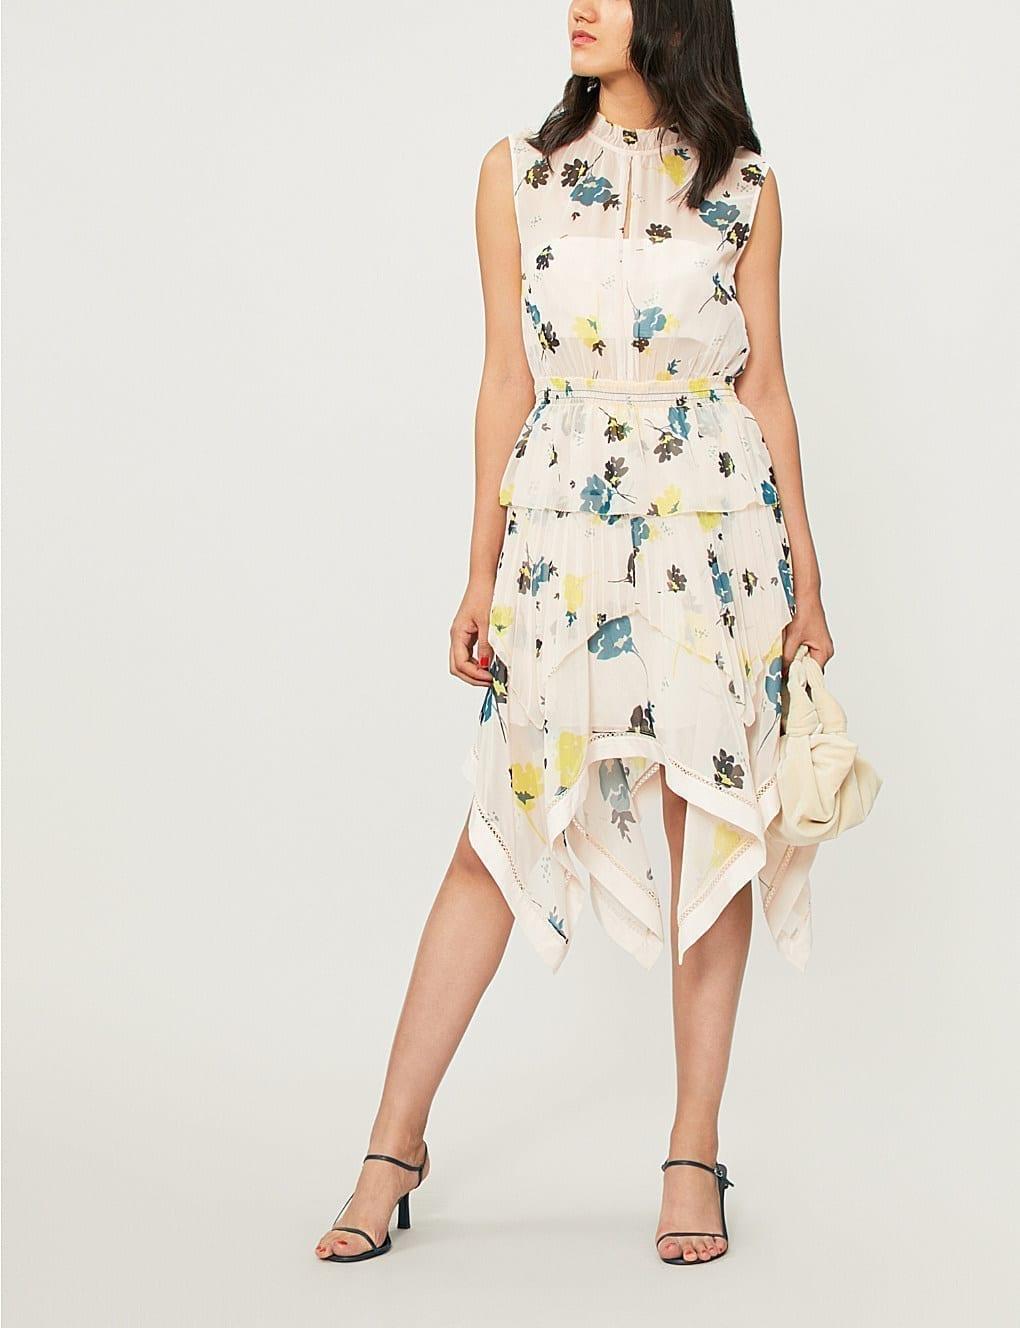 45396540cc89 SELF-PORTRAIT Asymmetric Graphic Chiffon Nude / Floral Printed Dress ...